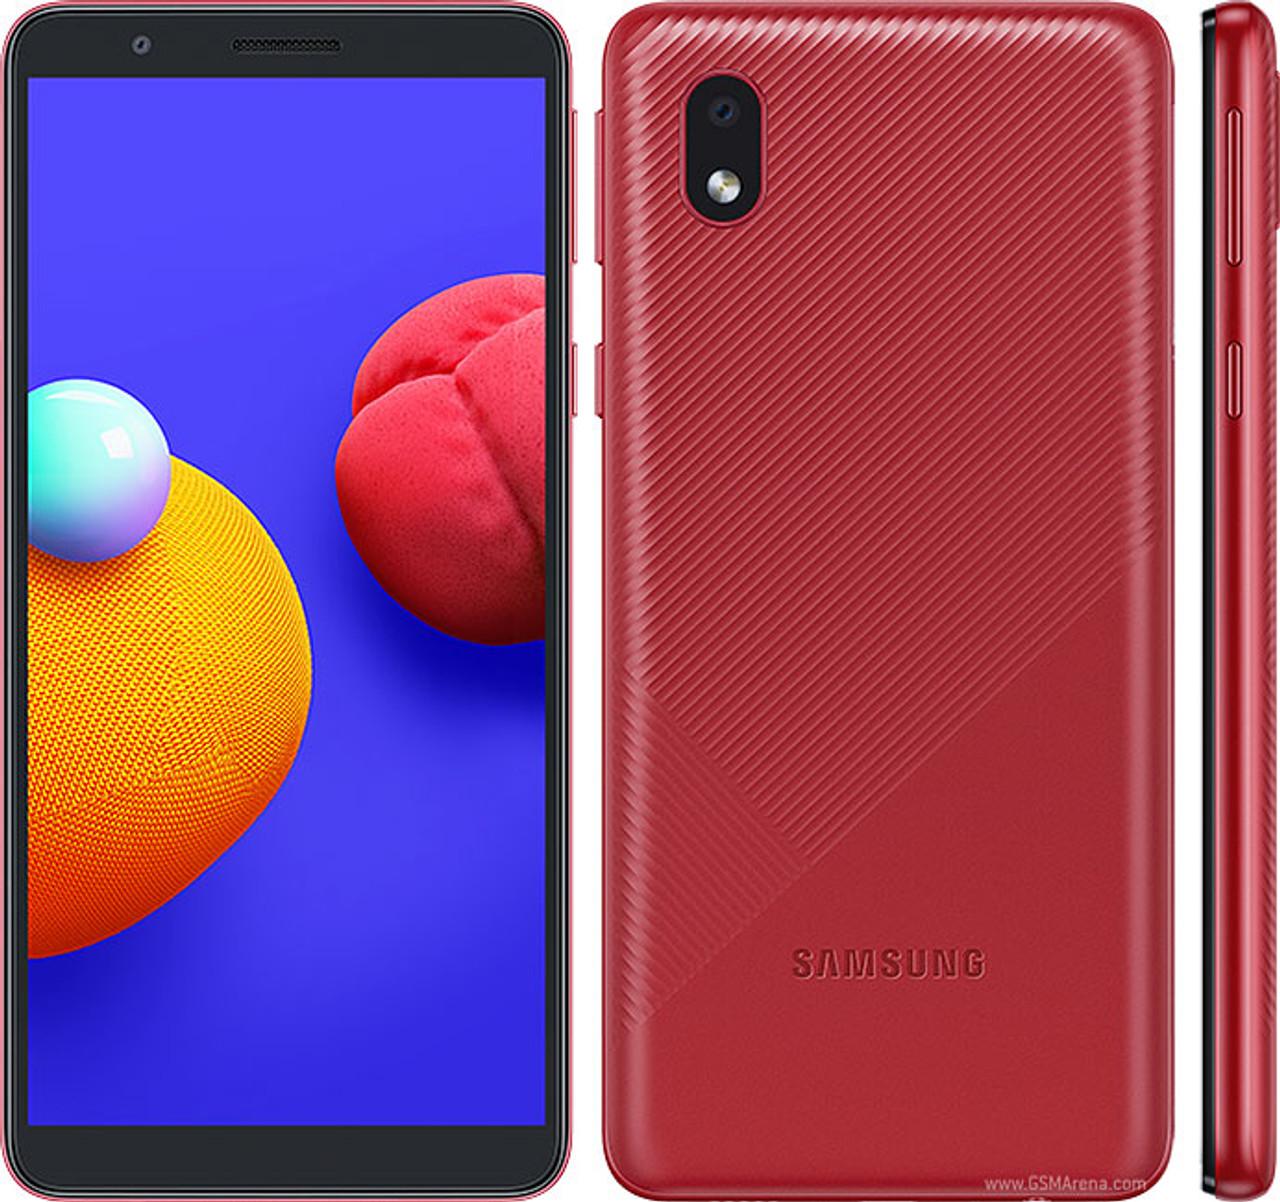 Samsung Galaxy A01 Core (16GB, 1GB RAM) , 8/5MP Camera Dual SIM GSM Factory Unlocked , Global 4G LTE   - *Ships from Miami*